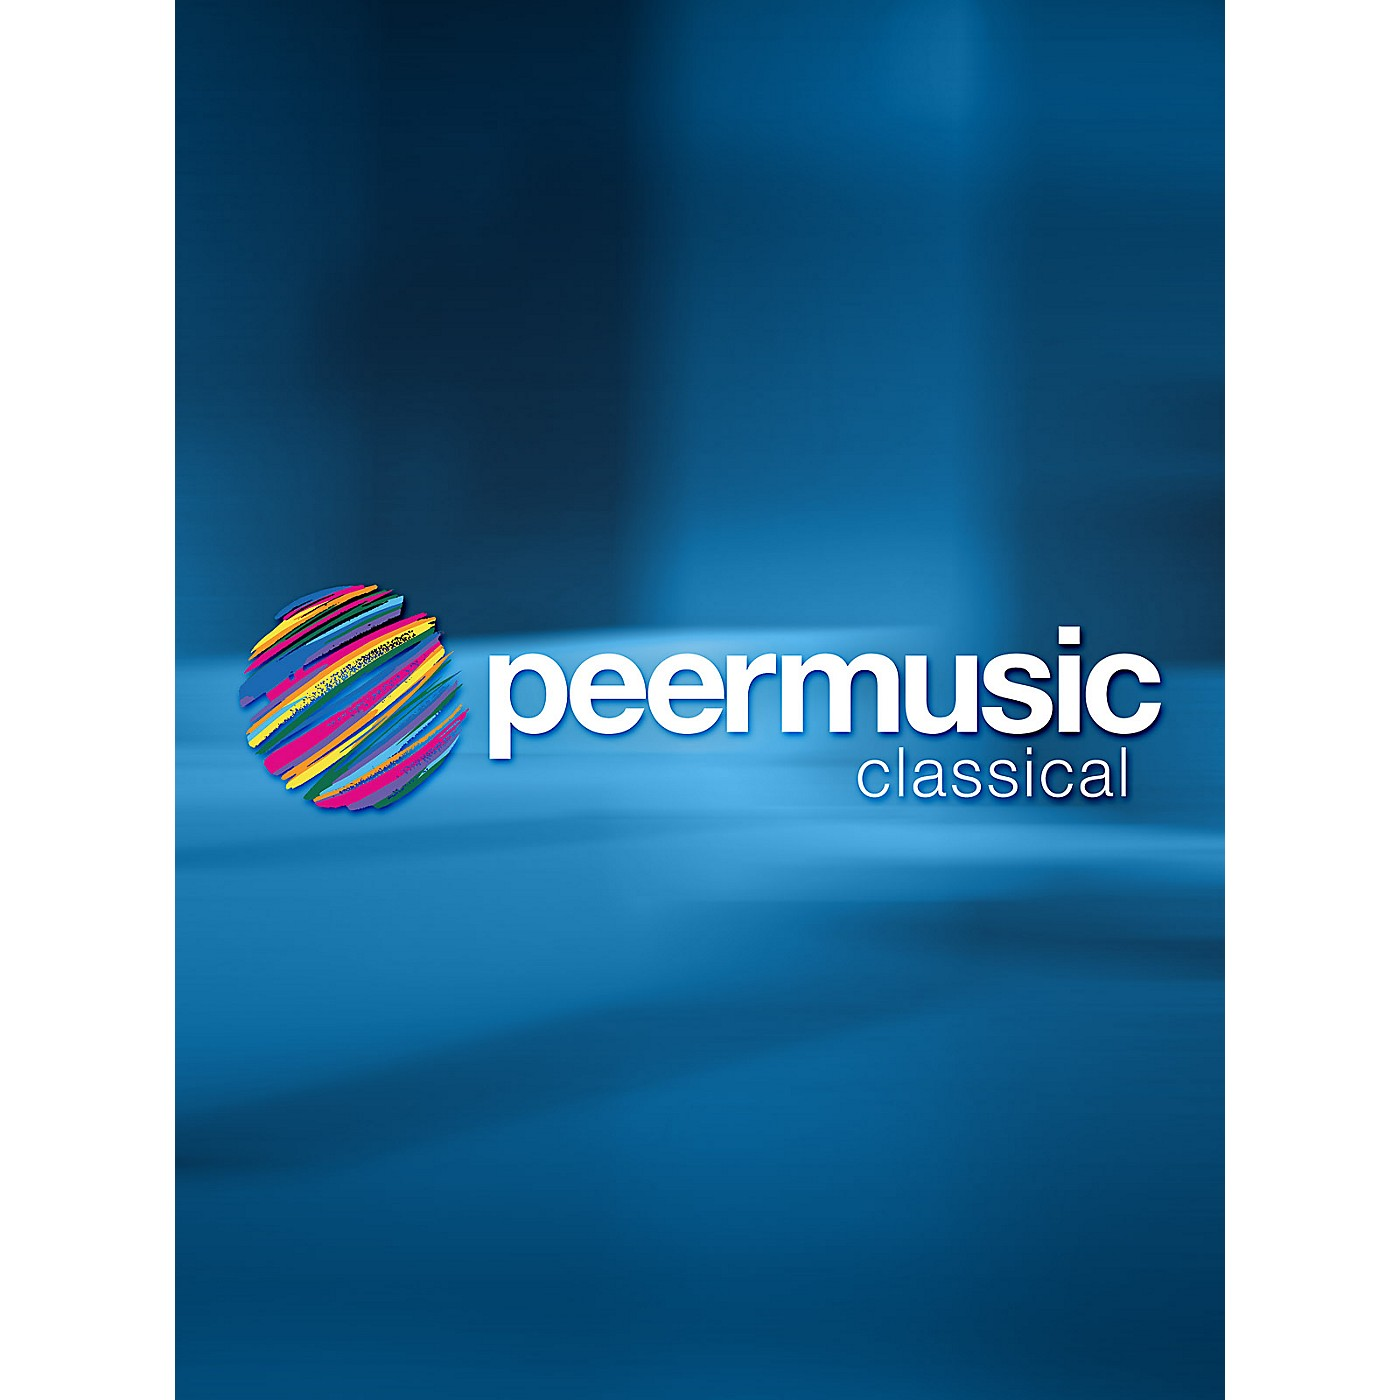 Peer Music Mulatash Stomp (B-flat Clarinet, Violin and Piano) Peermusic Classical Series Composed by Derek Bermel thumbnail